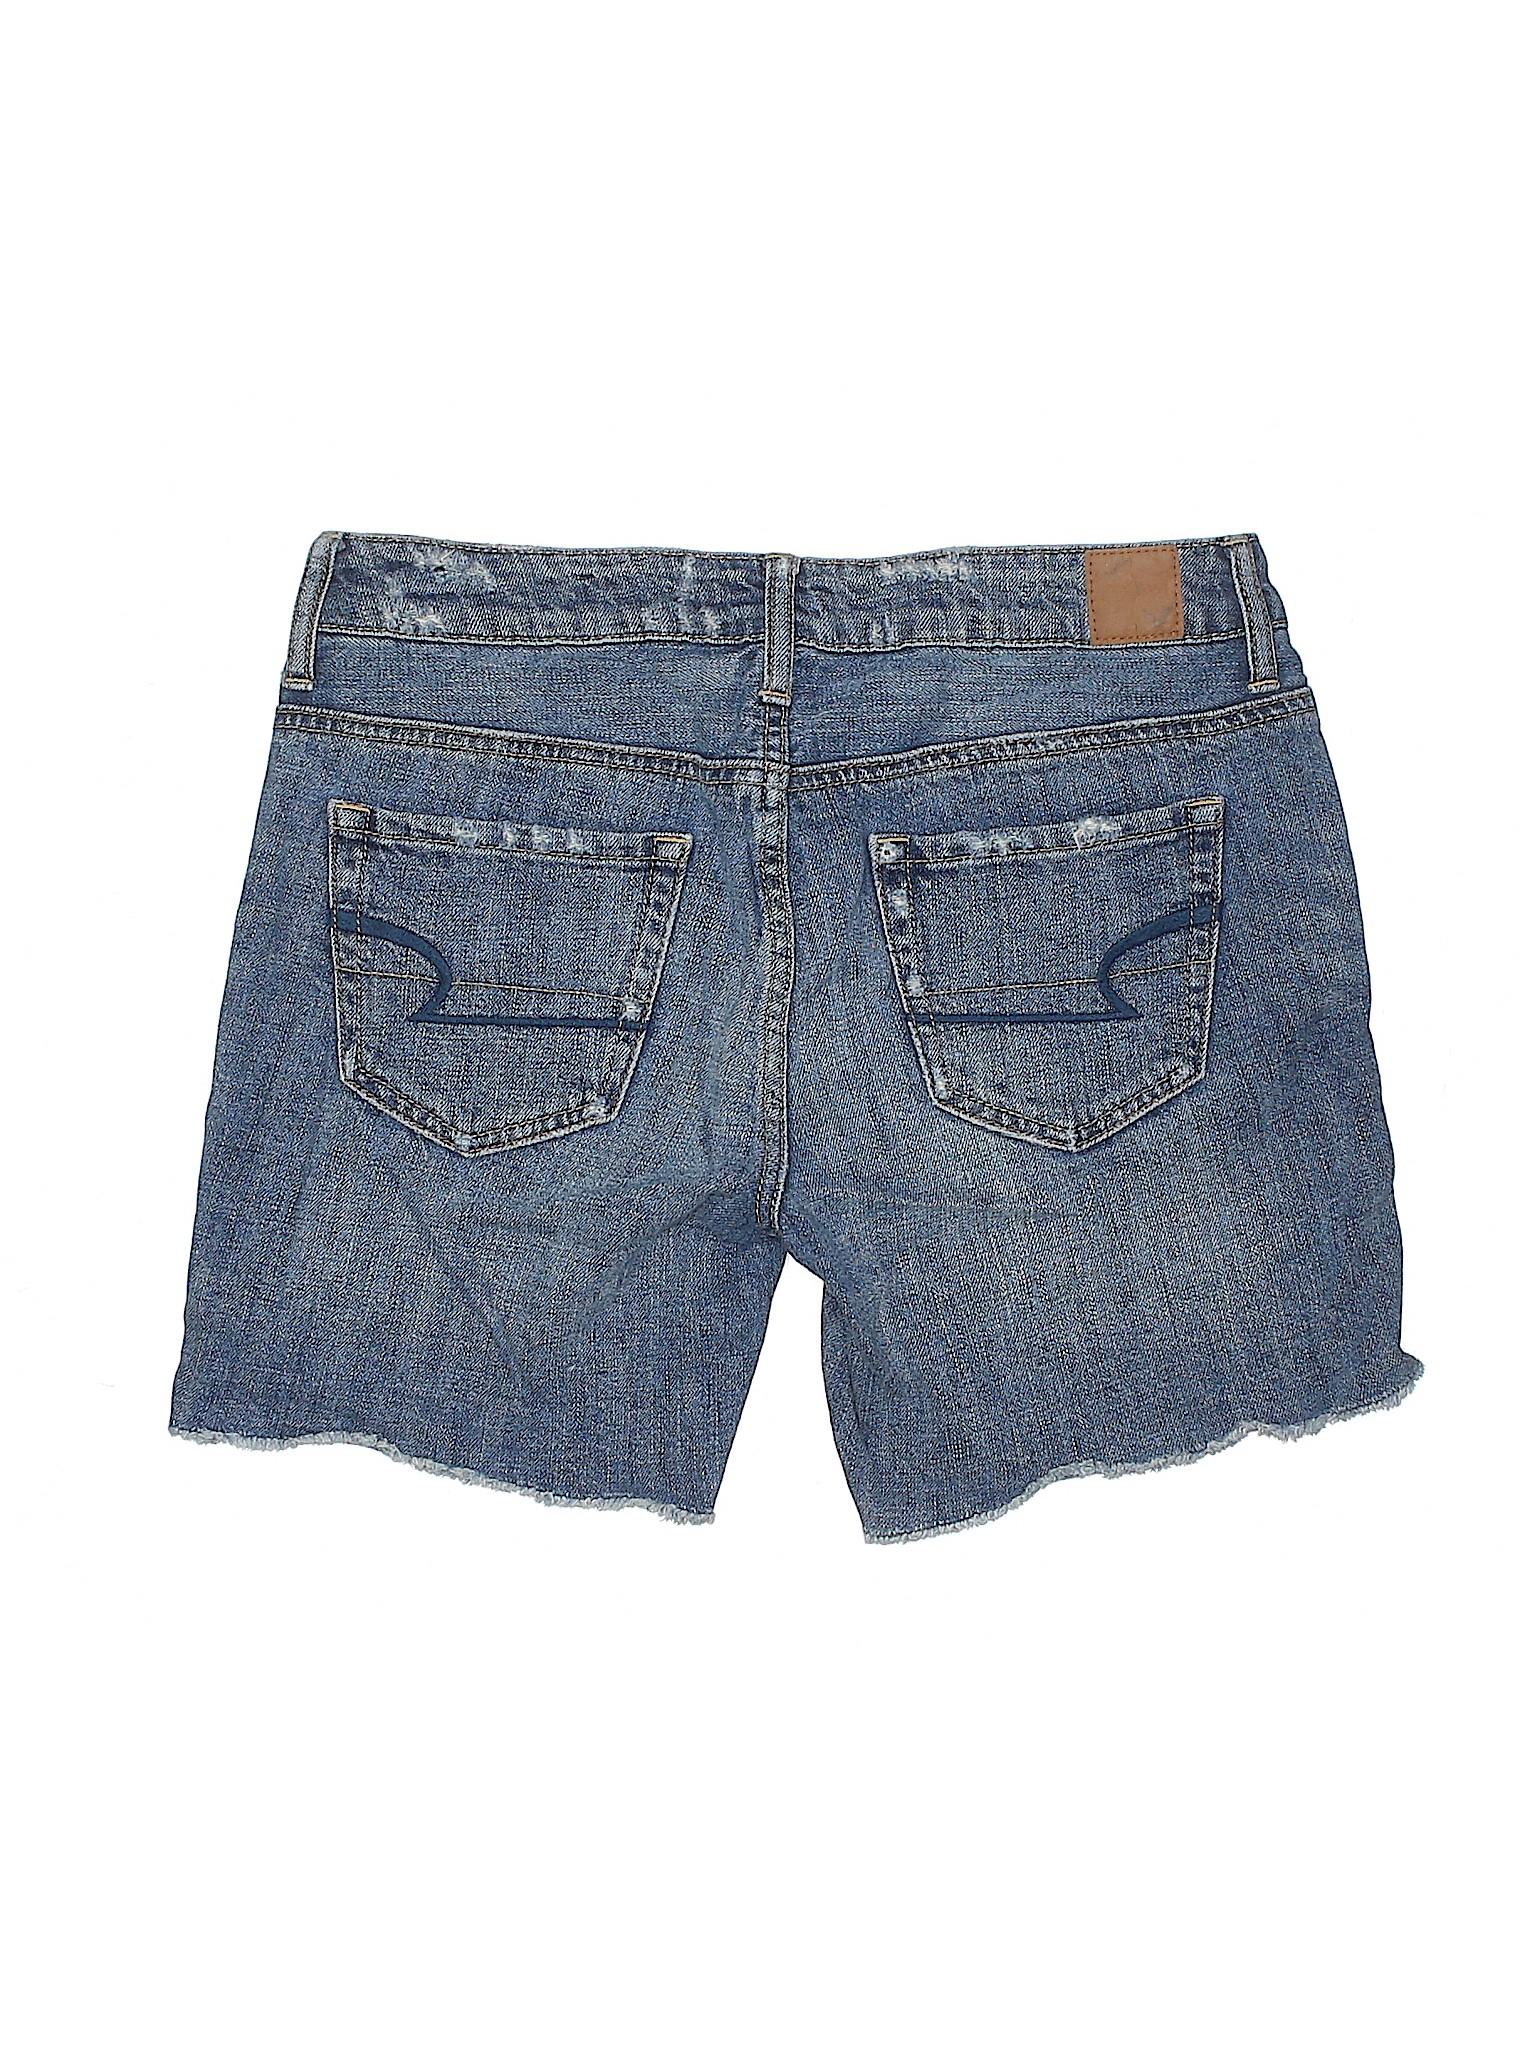 Shorts Outfitters Eagle American Boutique Denim q4Azwzv